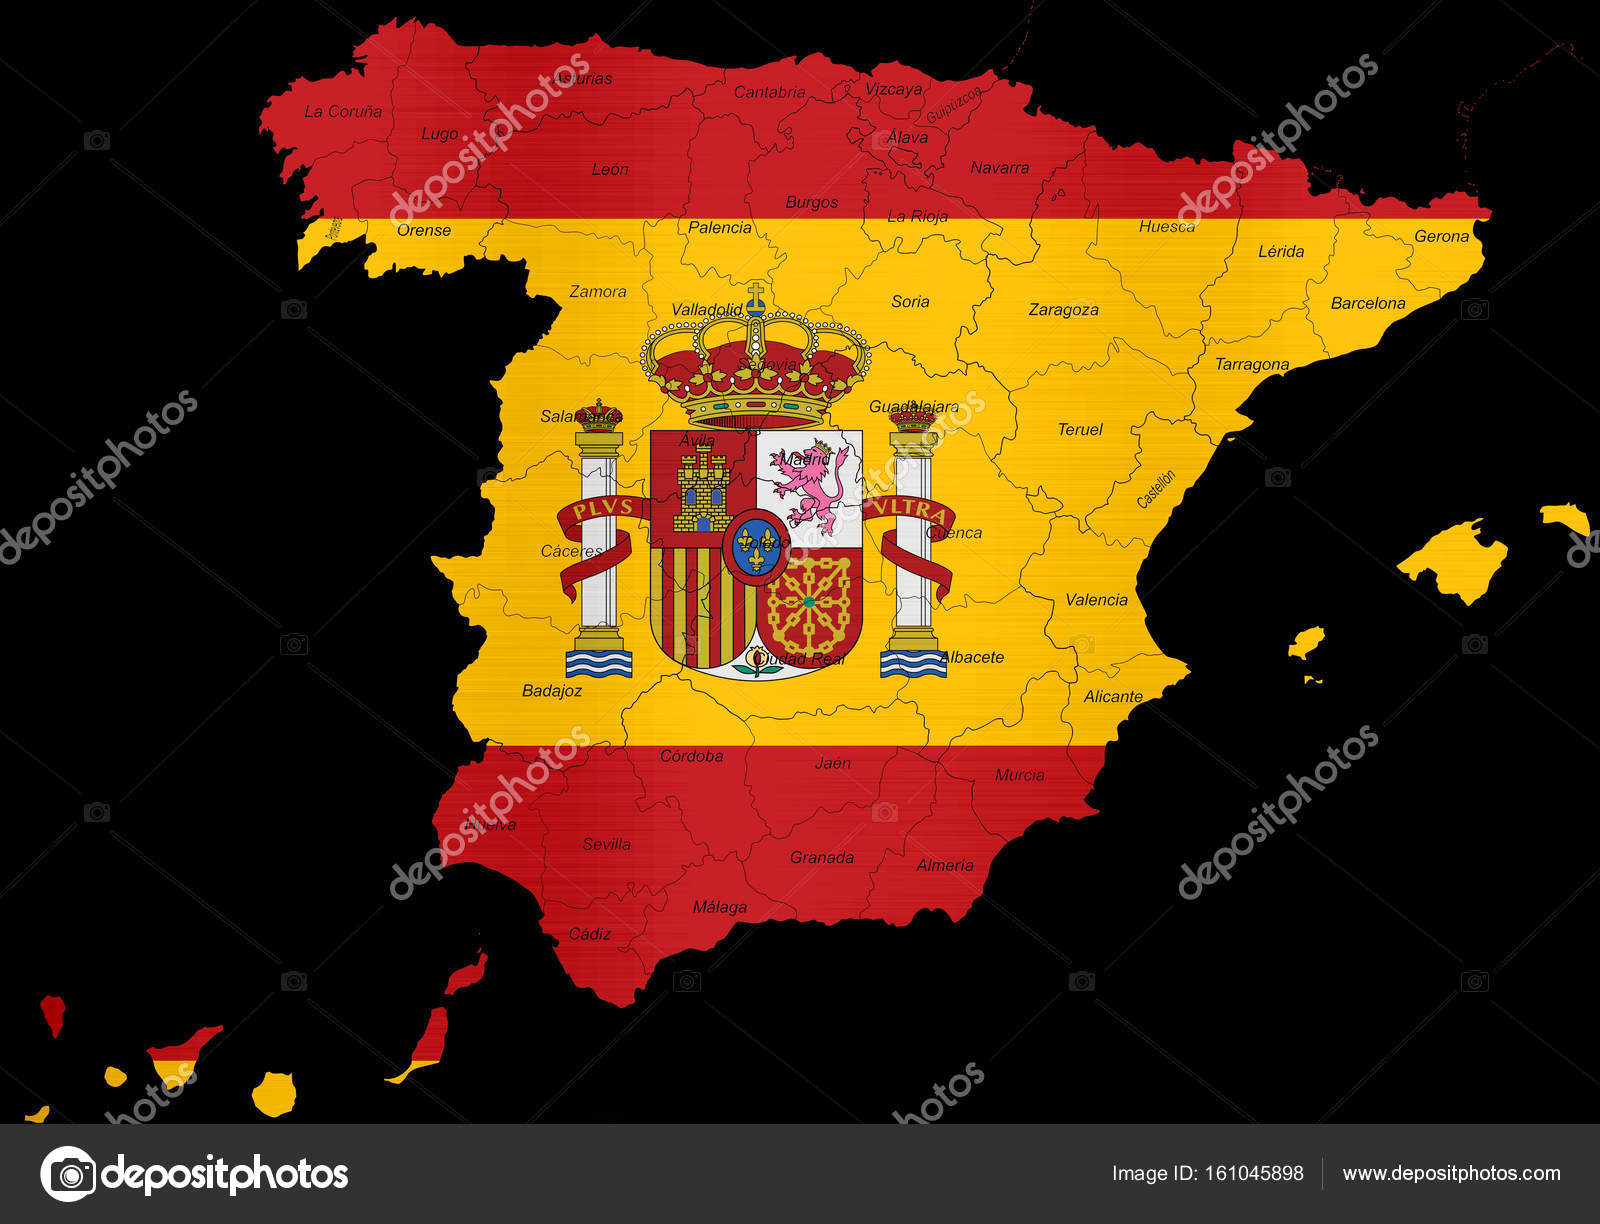 Spanien Regionen Karte.Spanien Flagge Karte Regionen Provinzen Stockfoto